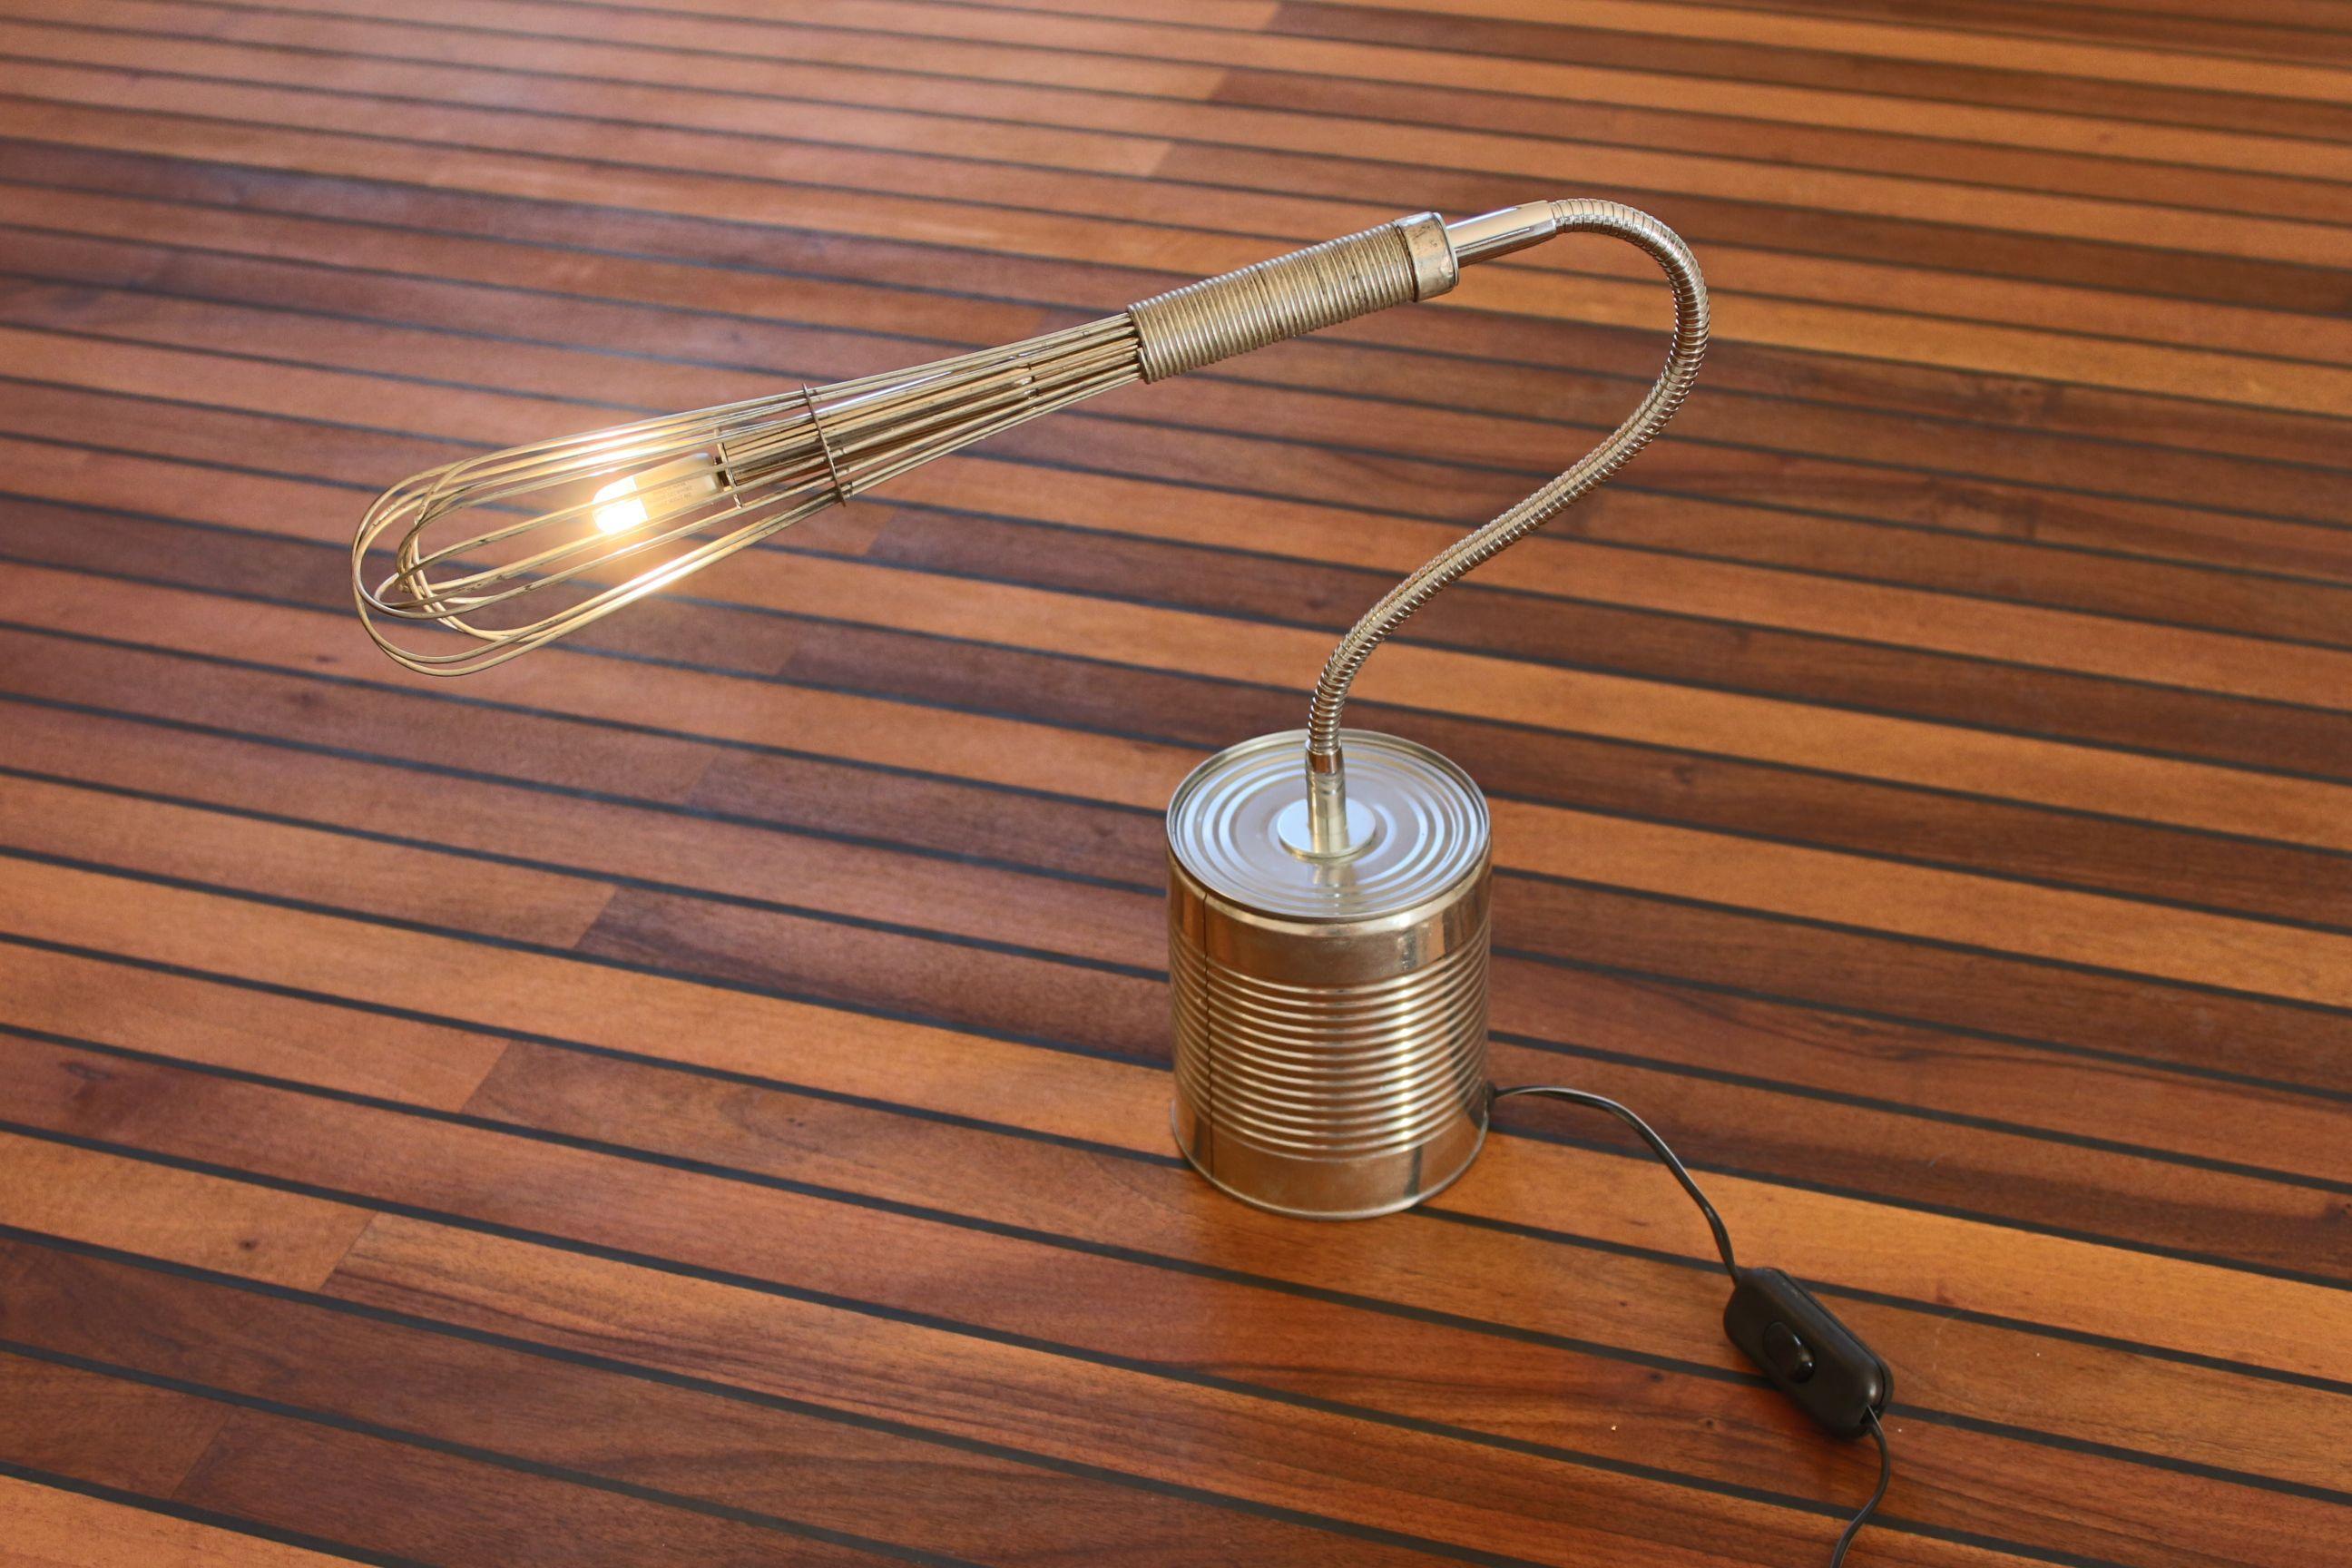 schneebesen umgebaud in upcyling lampe diy basteltipp upcycling lampen und leuchten selber. Black Bedroom Furniture Sets. Home Design Ideas